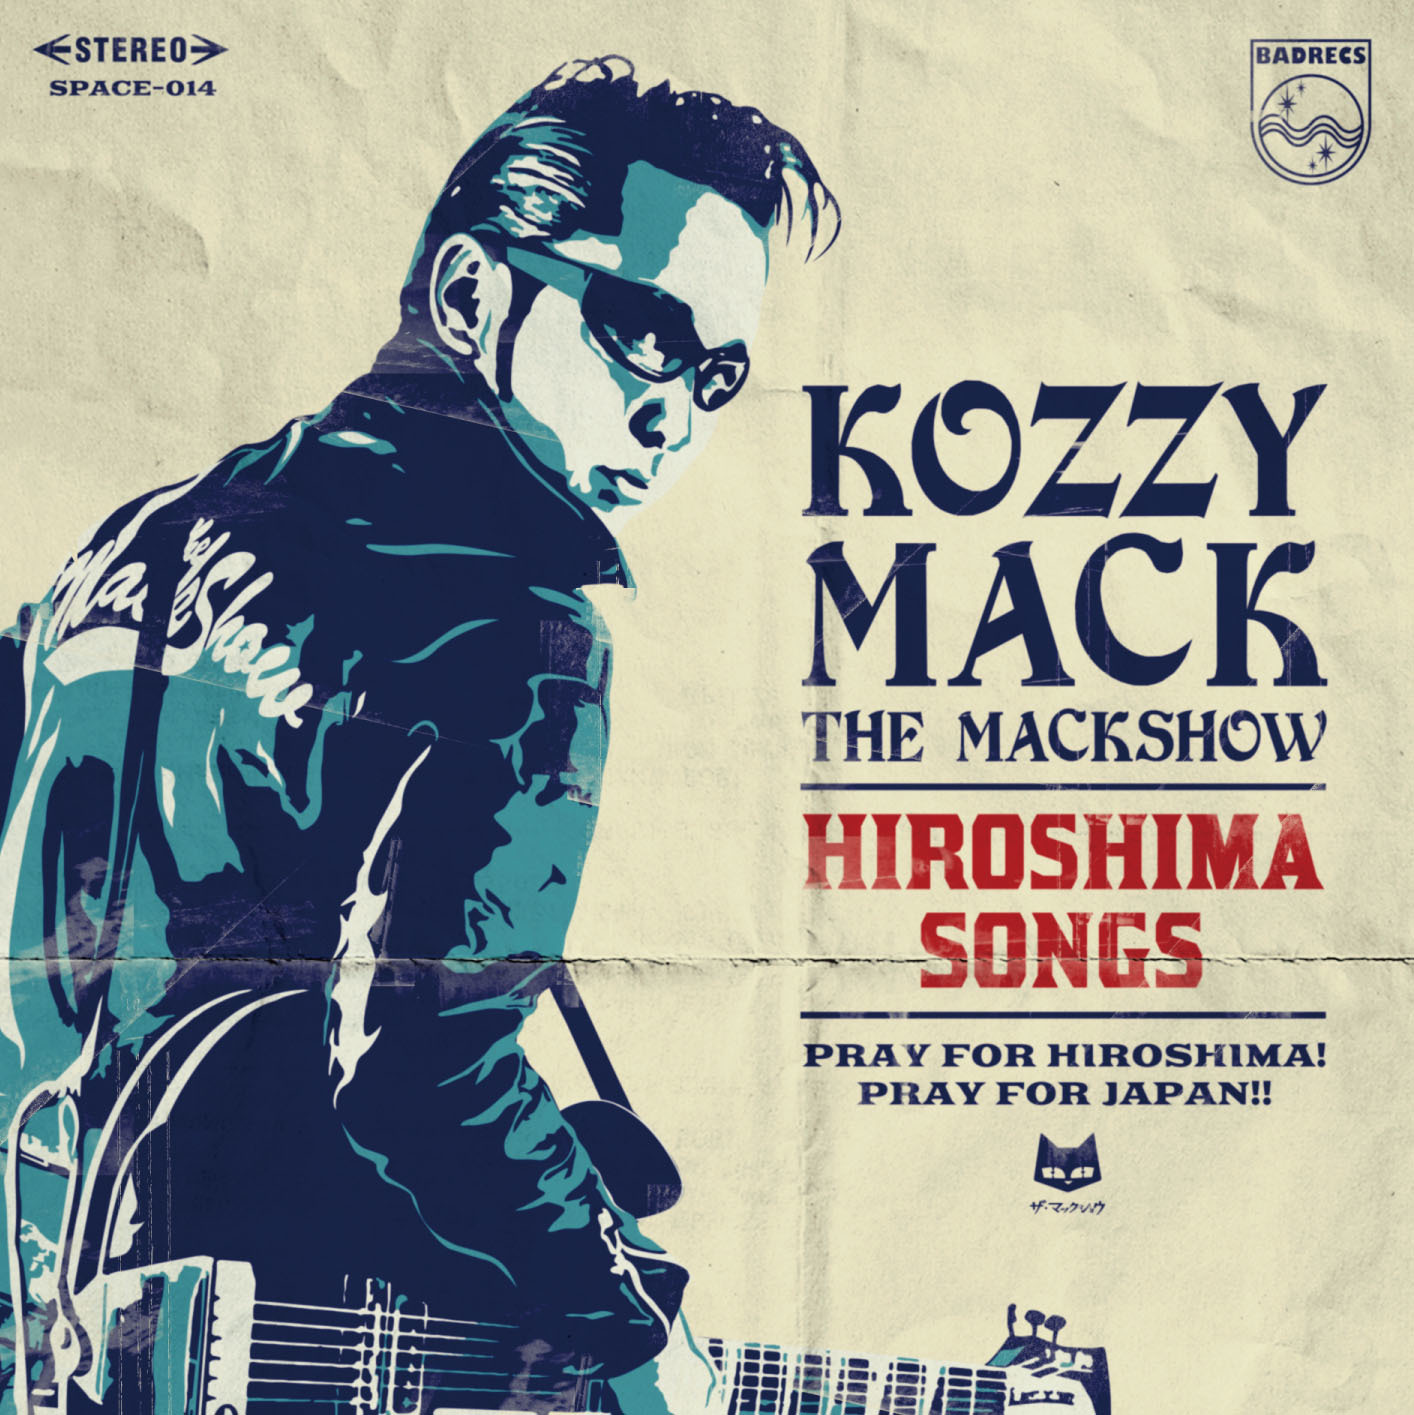 KOZZY MACK「HIROSHIMA SONGS」CD+KOZZY MACK限定Tシャツ チャリティーセットRVCD-038